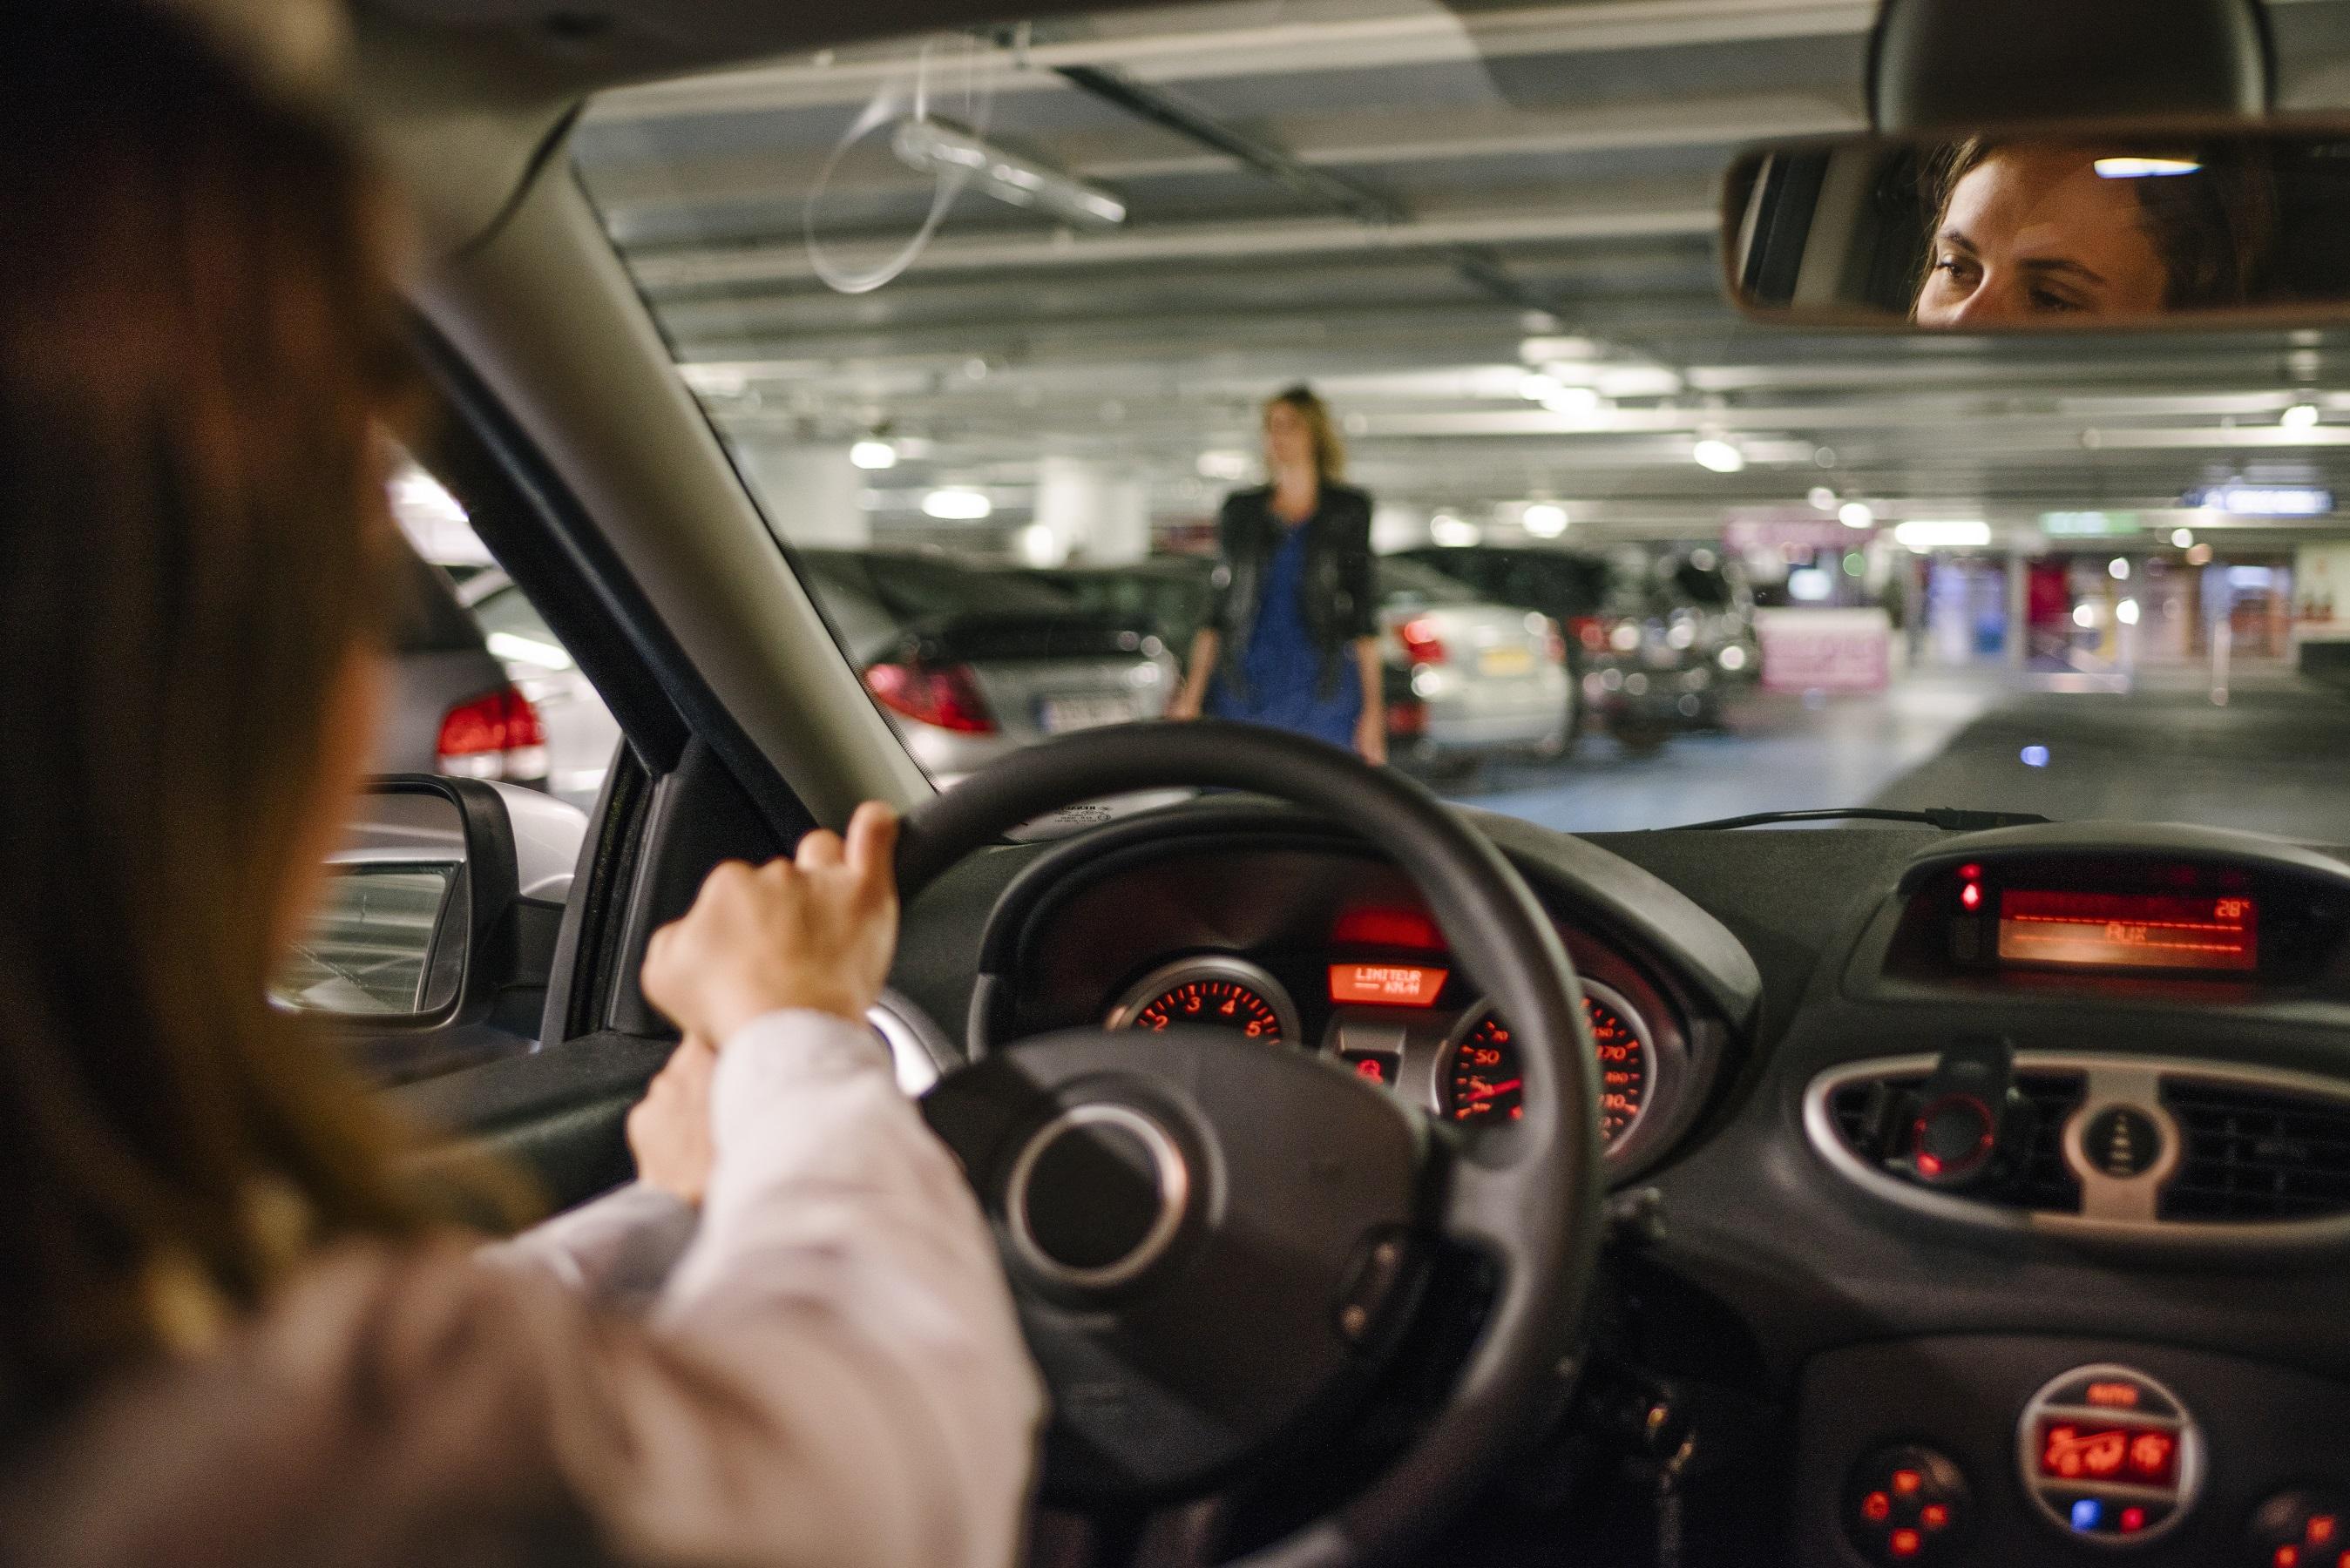 Parking Indigo Nogent Sur Marne Parking Du Marché